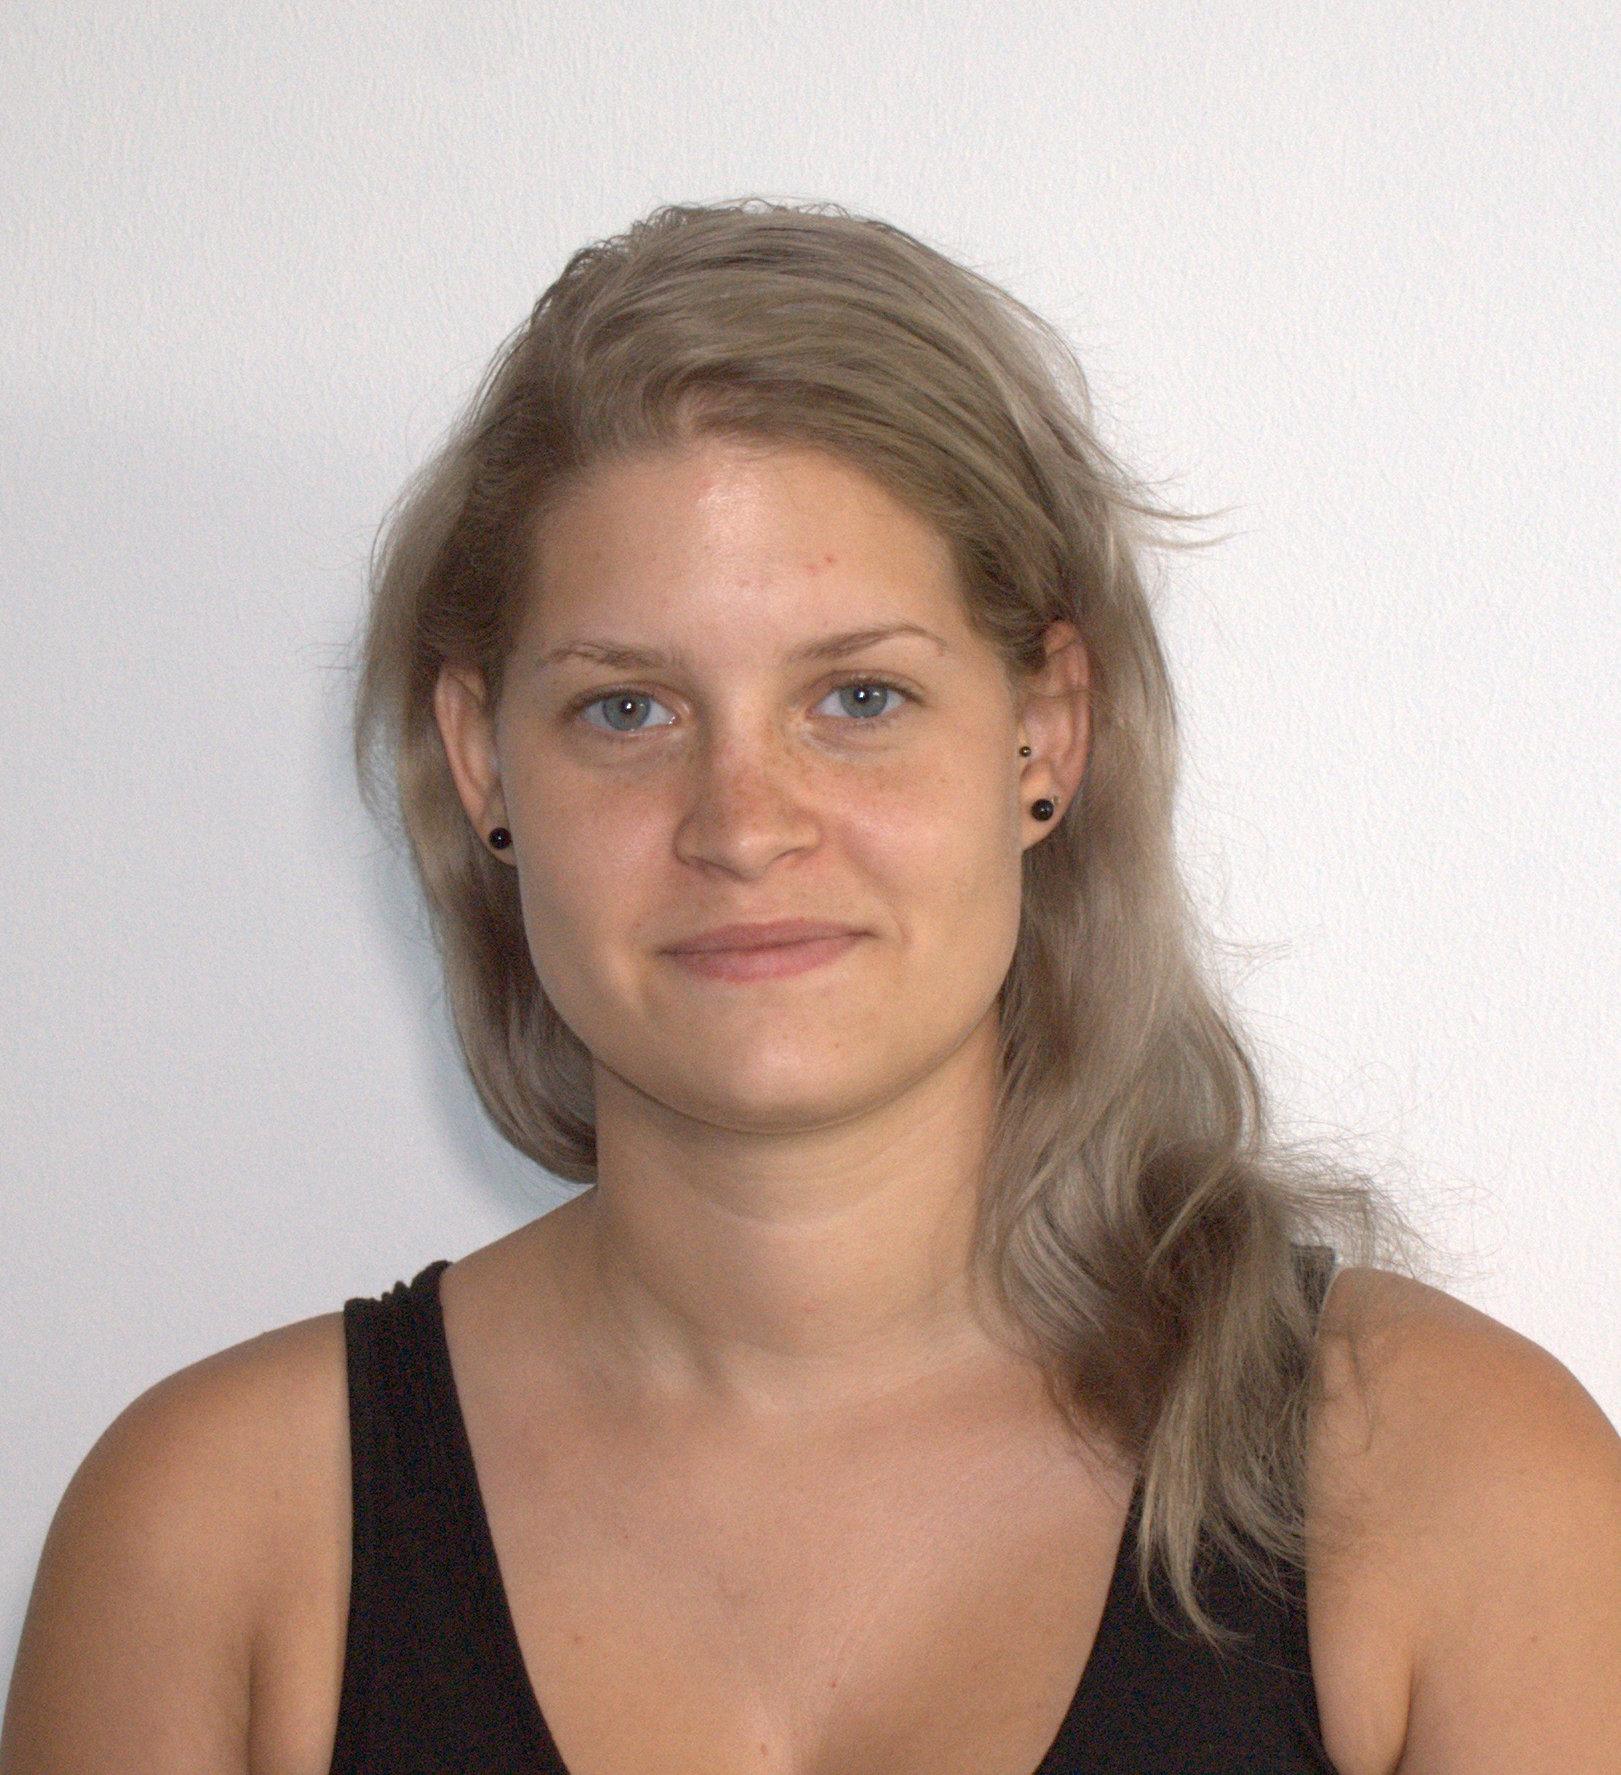 Michaela - Vorher